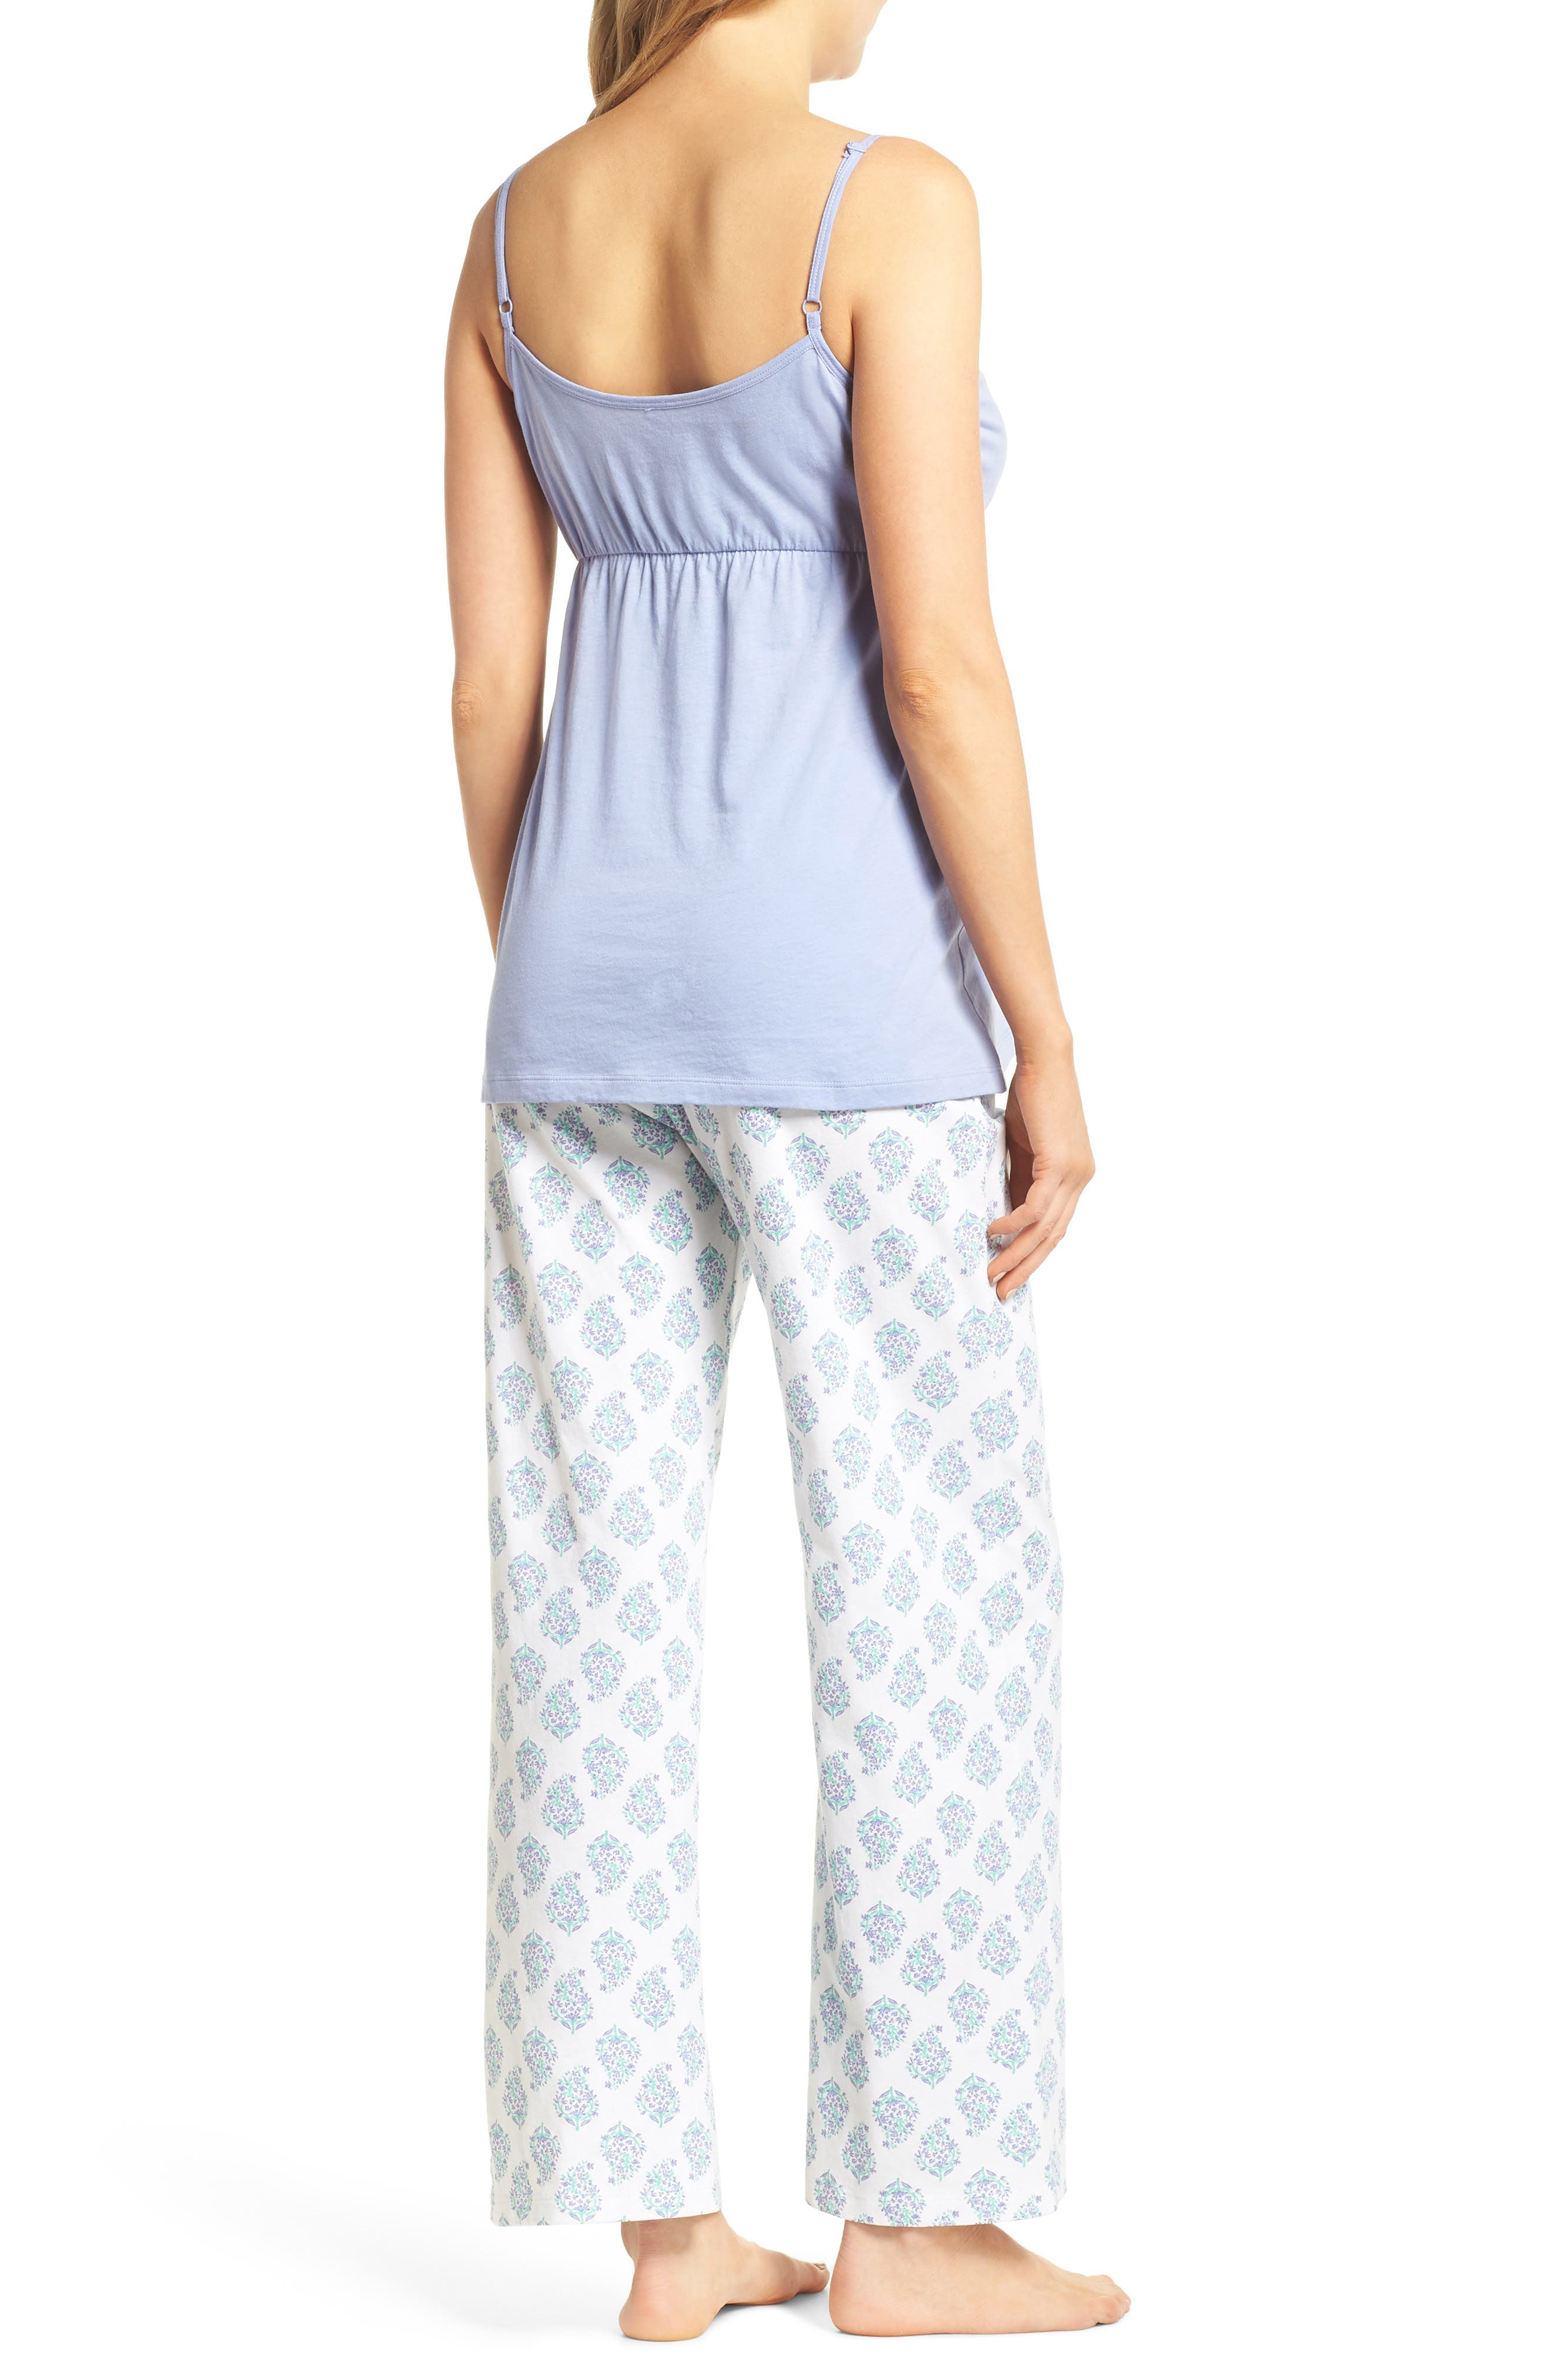 Violette Maternity/Nursing Pajamas,                             Alternate thumbnail 2, color,                             Indian Print